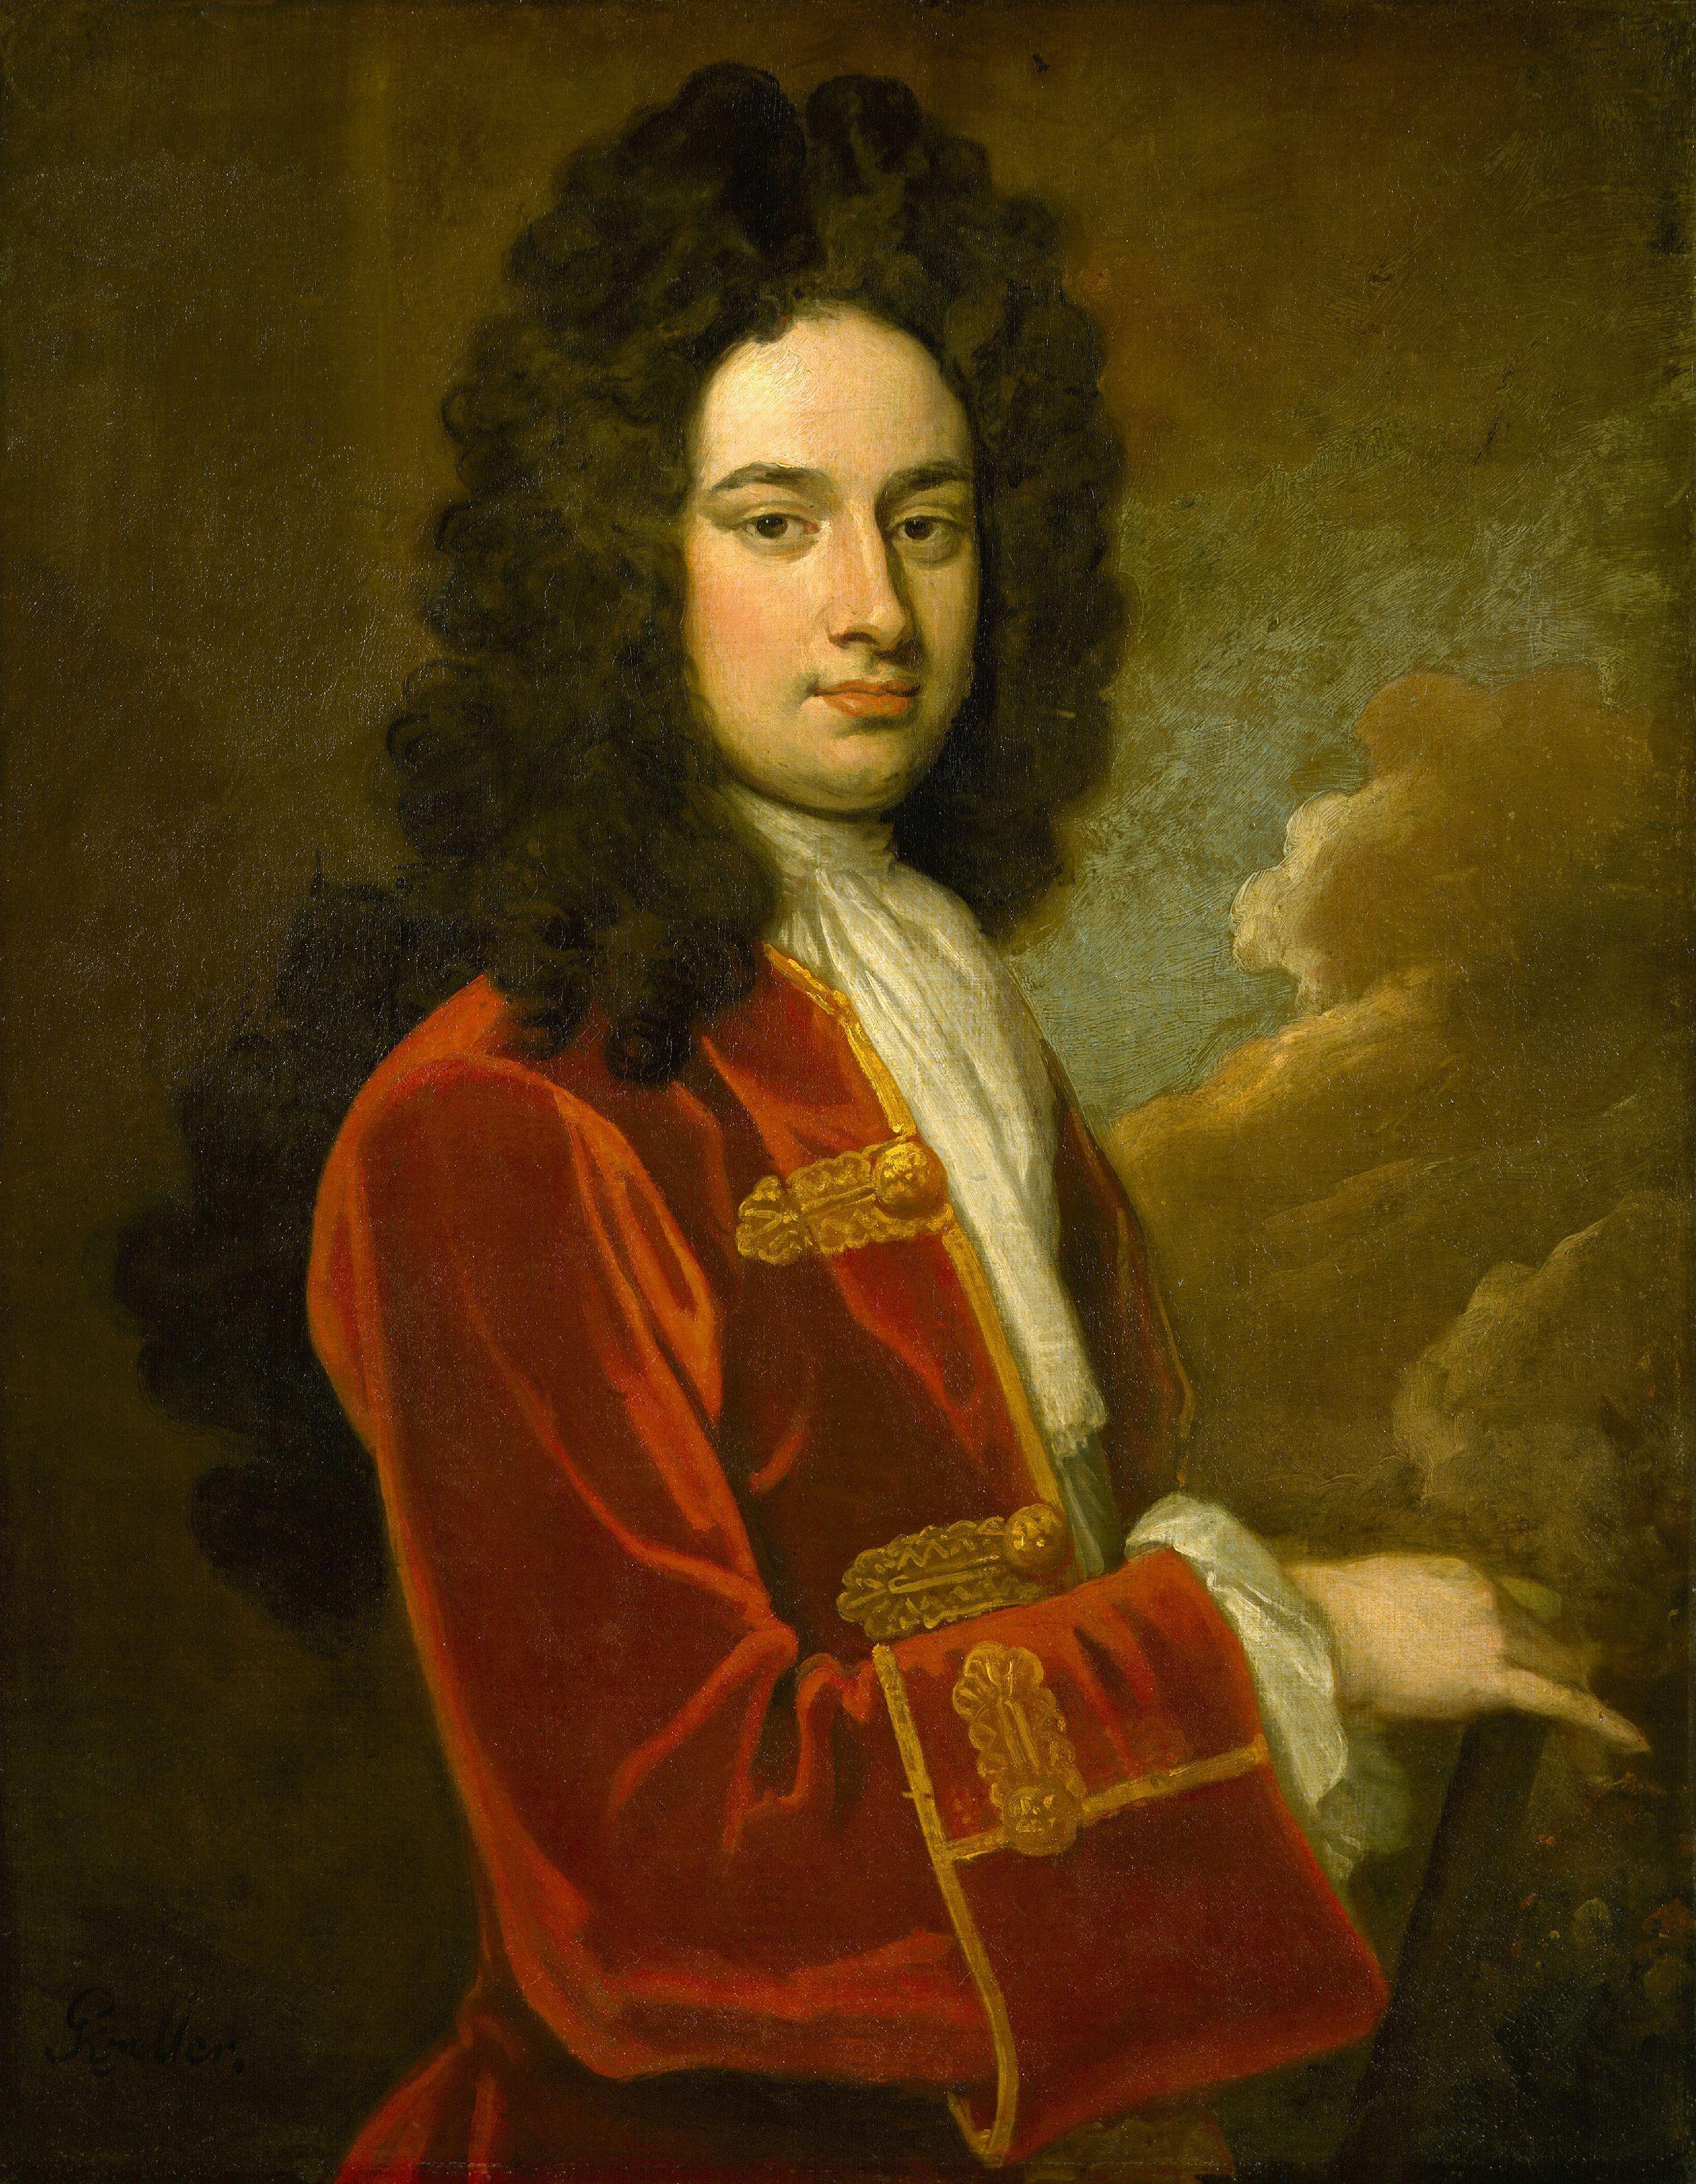 James Stanhope, primer conde de Stanhope